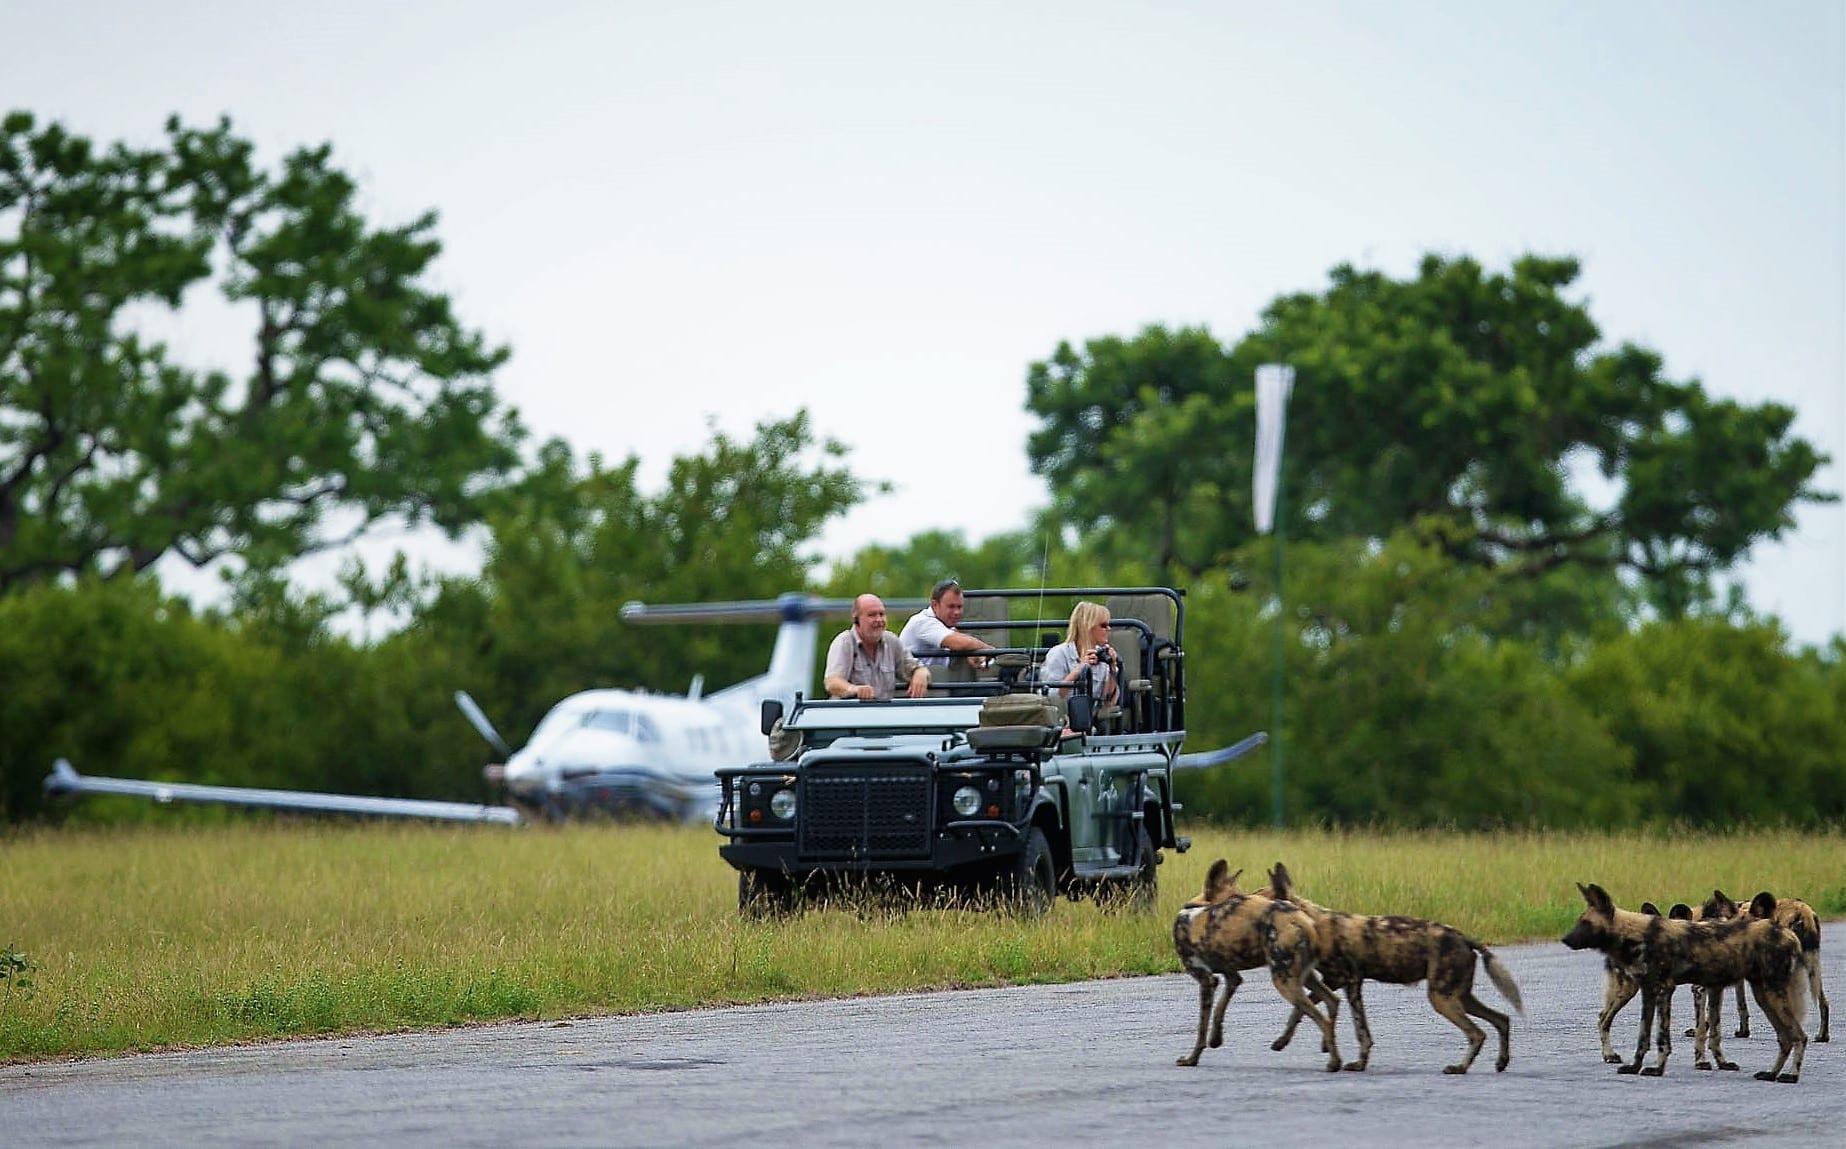 Wild dog on runway at Singita